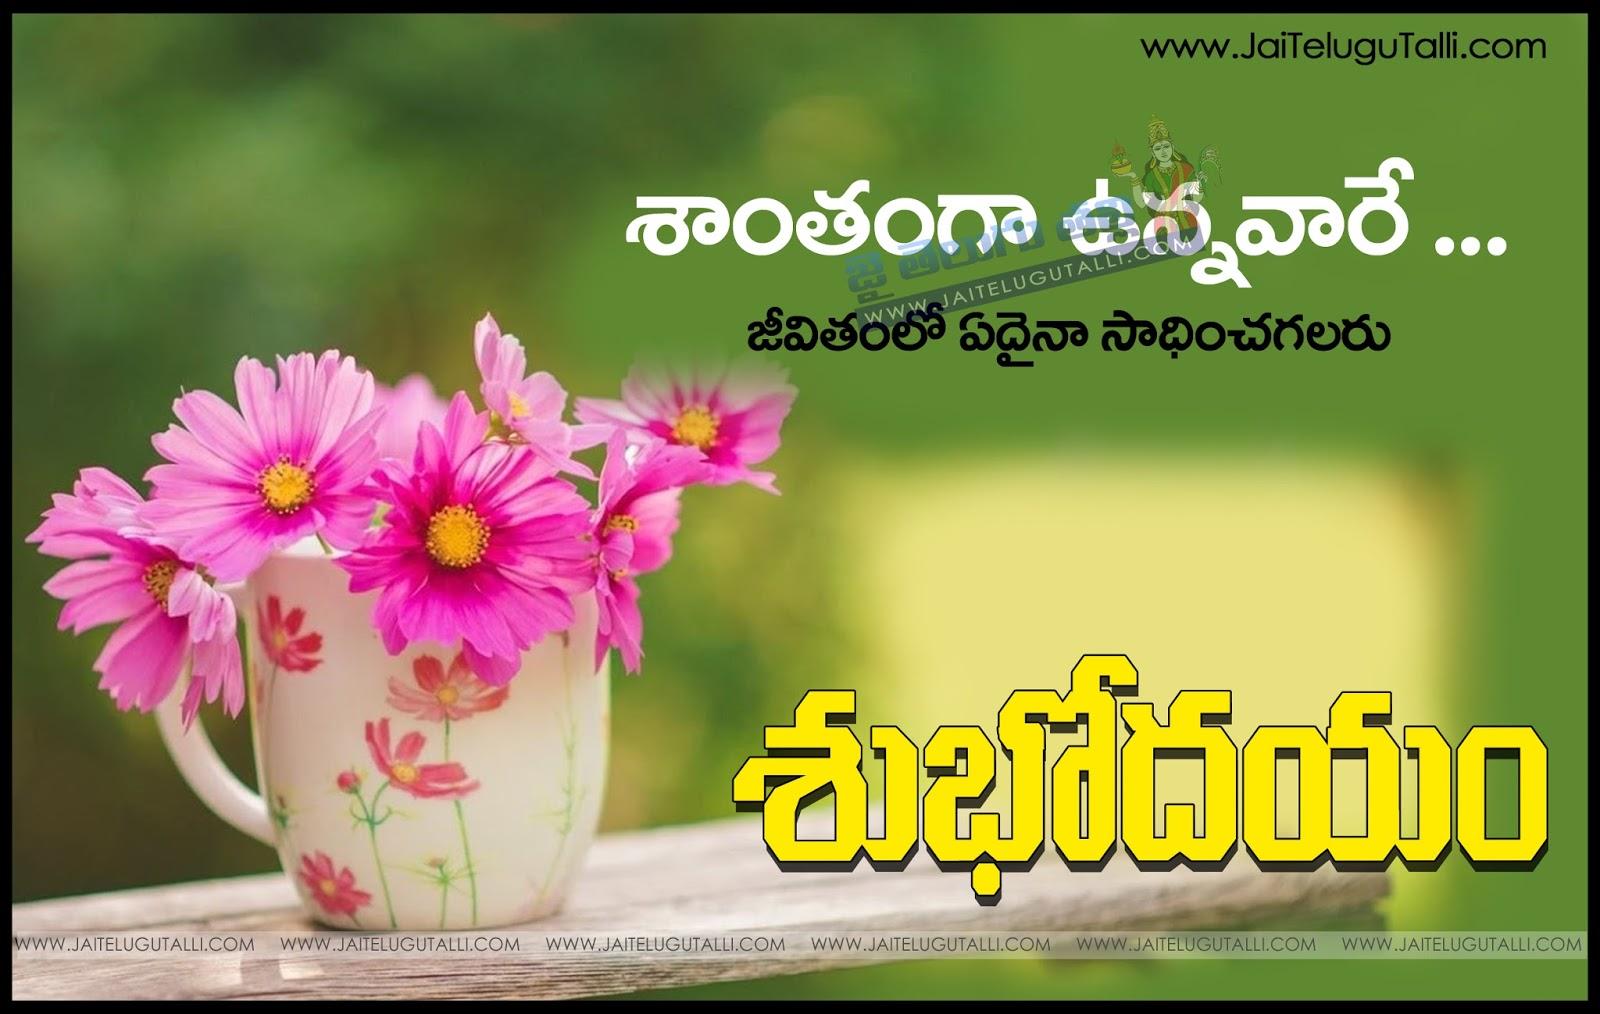 Telugu Good Morning Quotes Hd Wallpapers Gautama Buddha Quotes Best